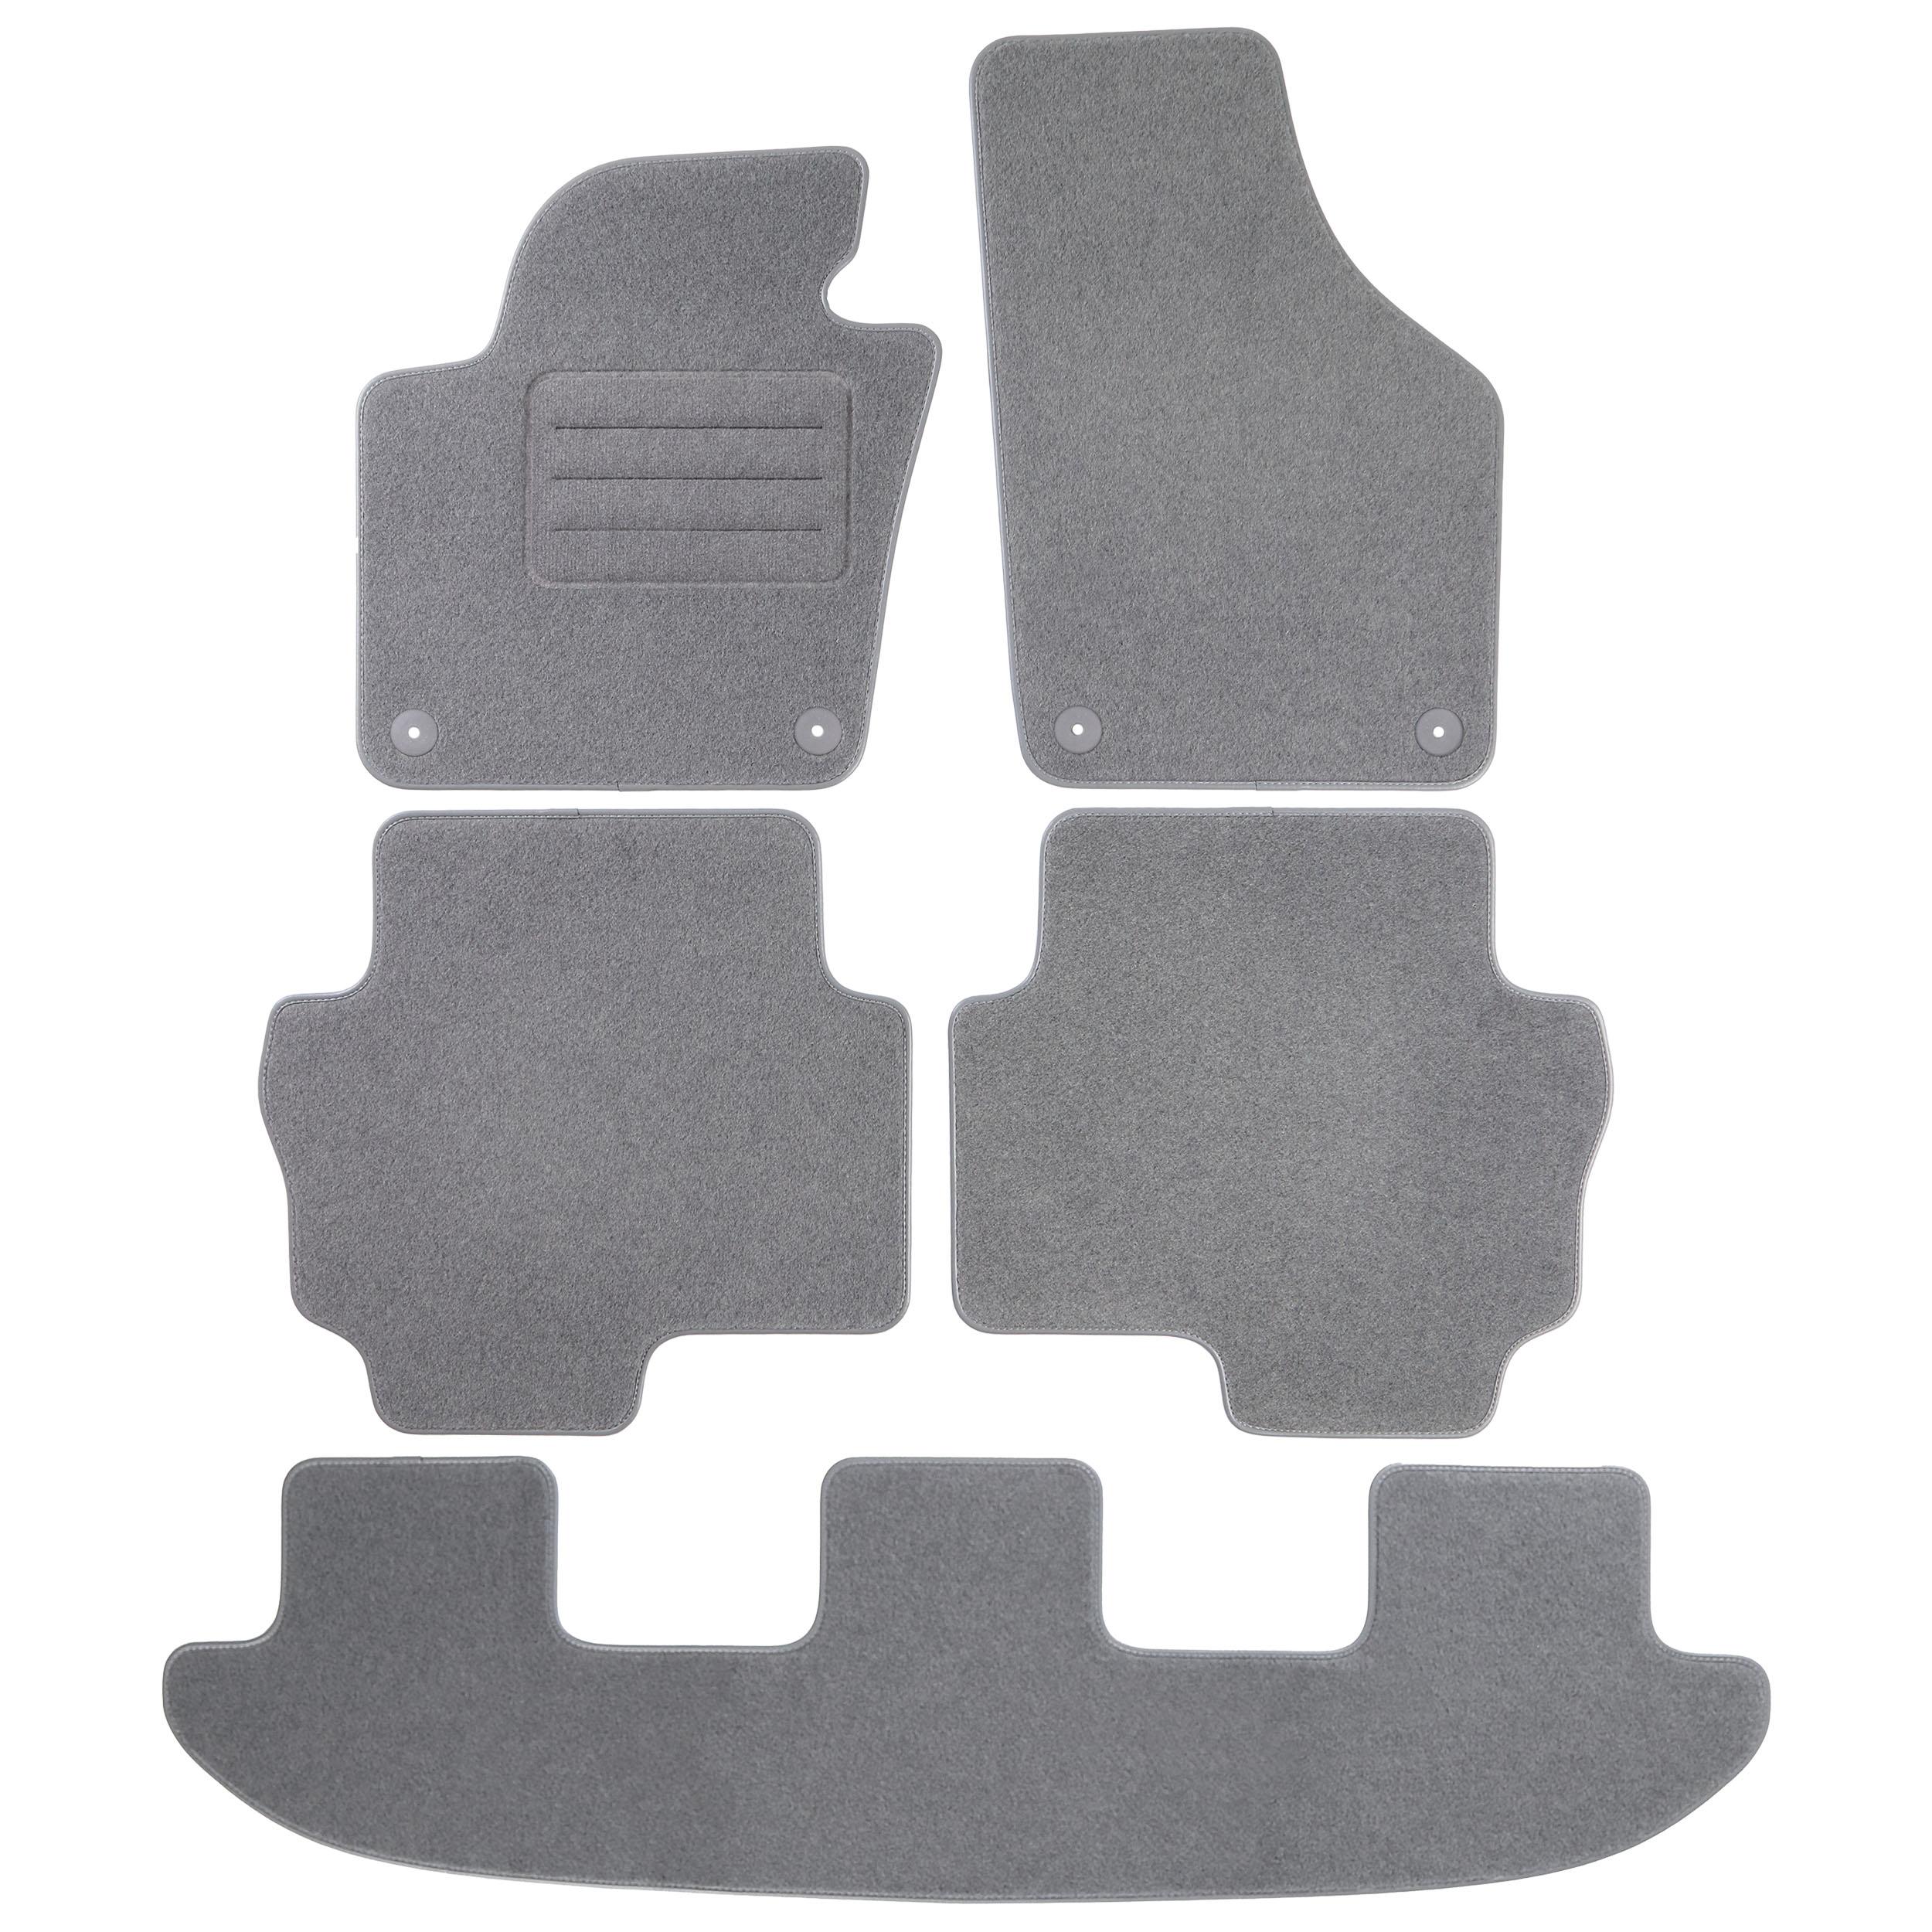 vw sharan ii 7 sitzer grau fu matten autoteppiche bj 2010. Black Bedroom Furniture Sets. Home Design Ideas